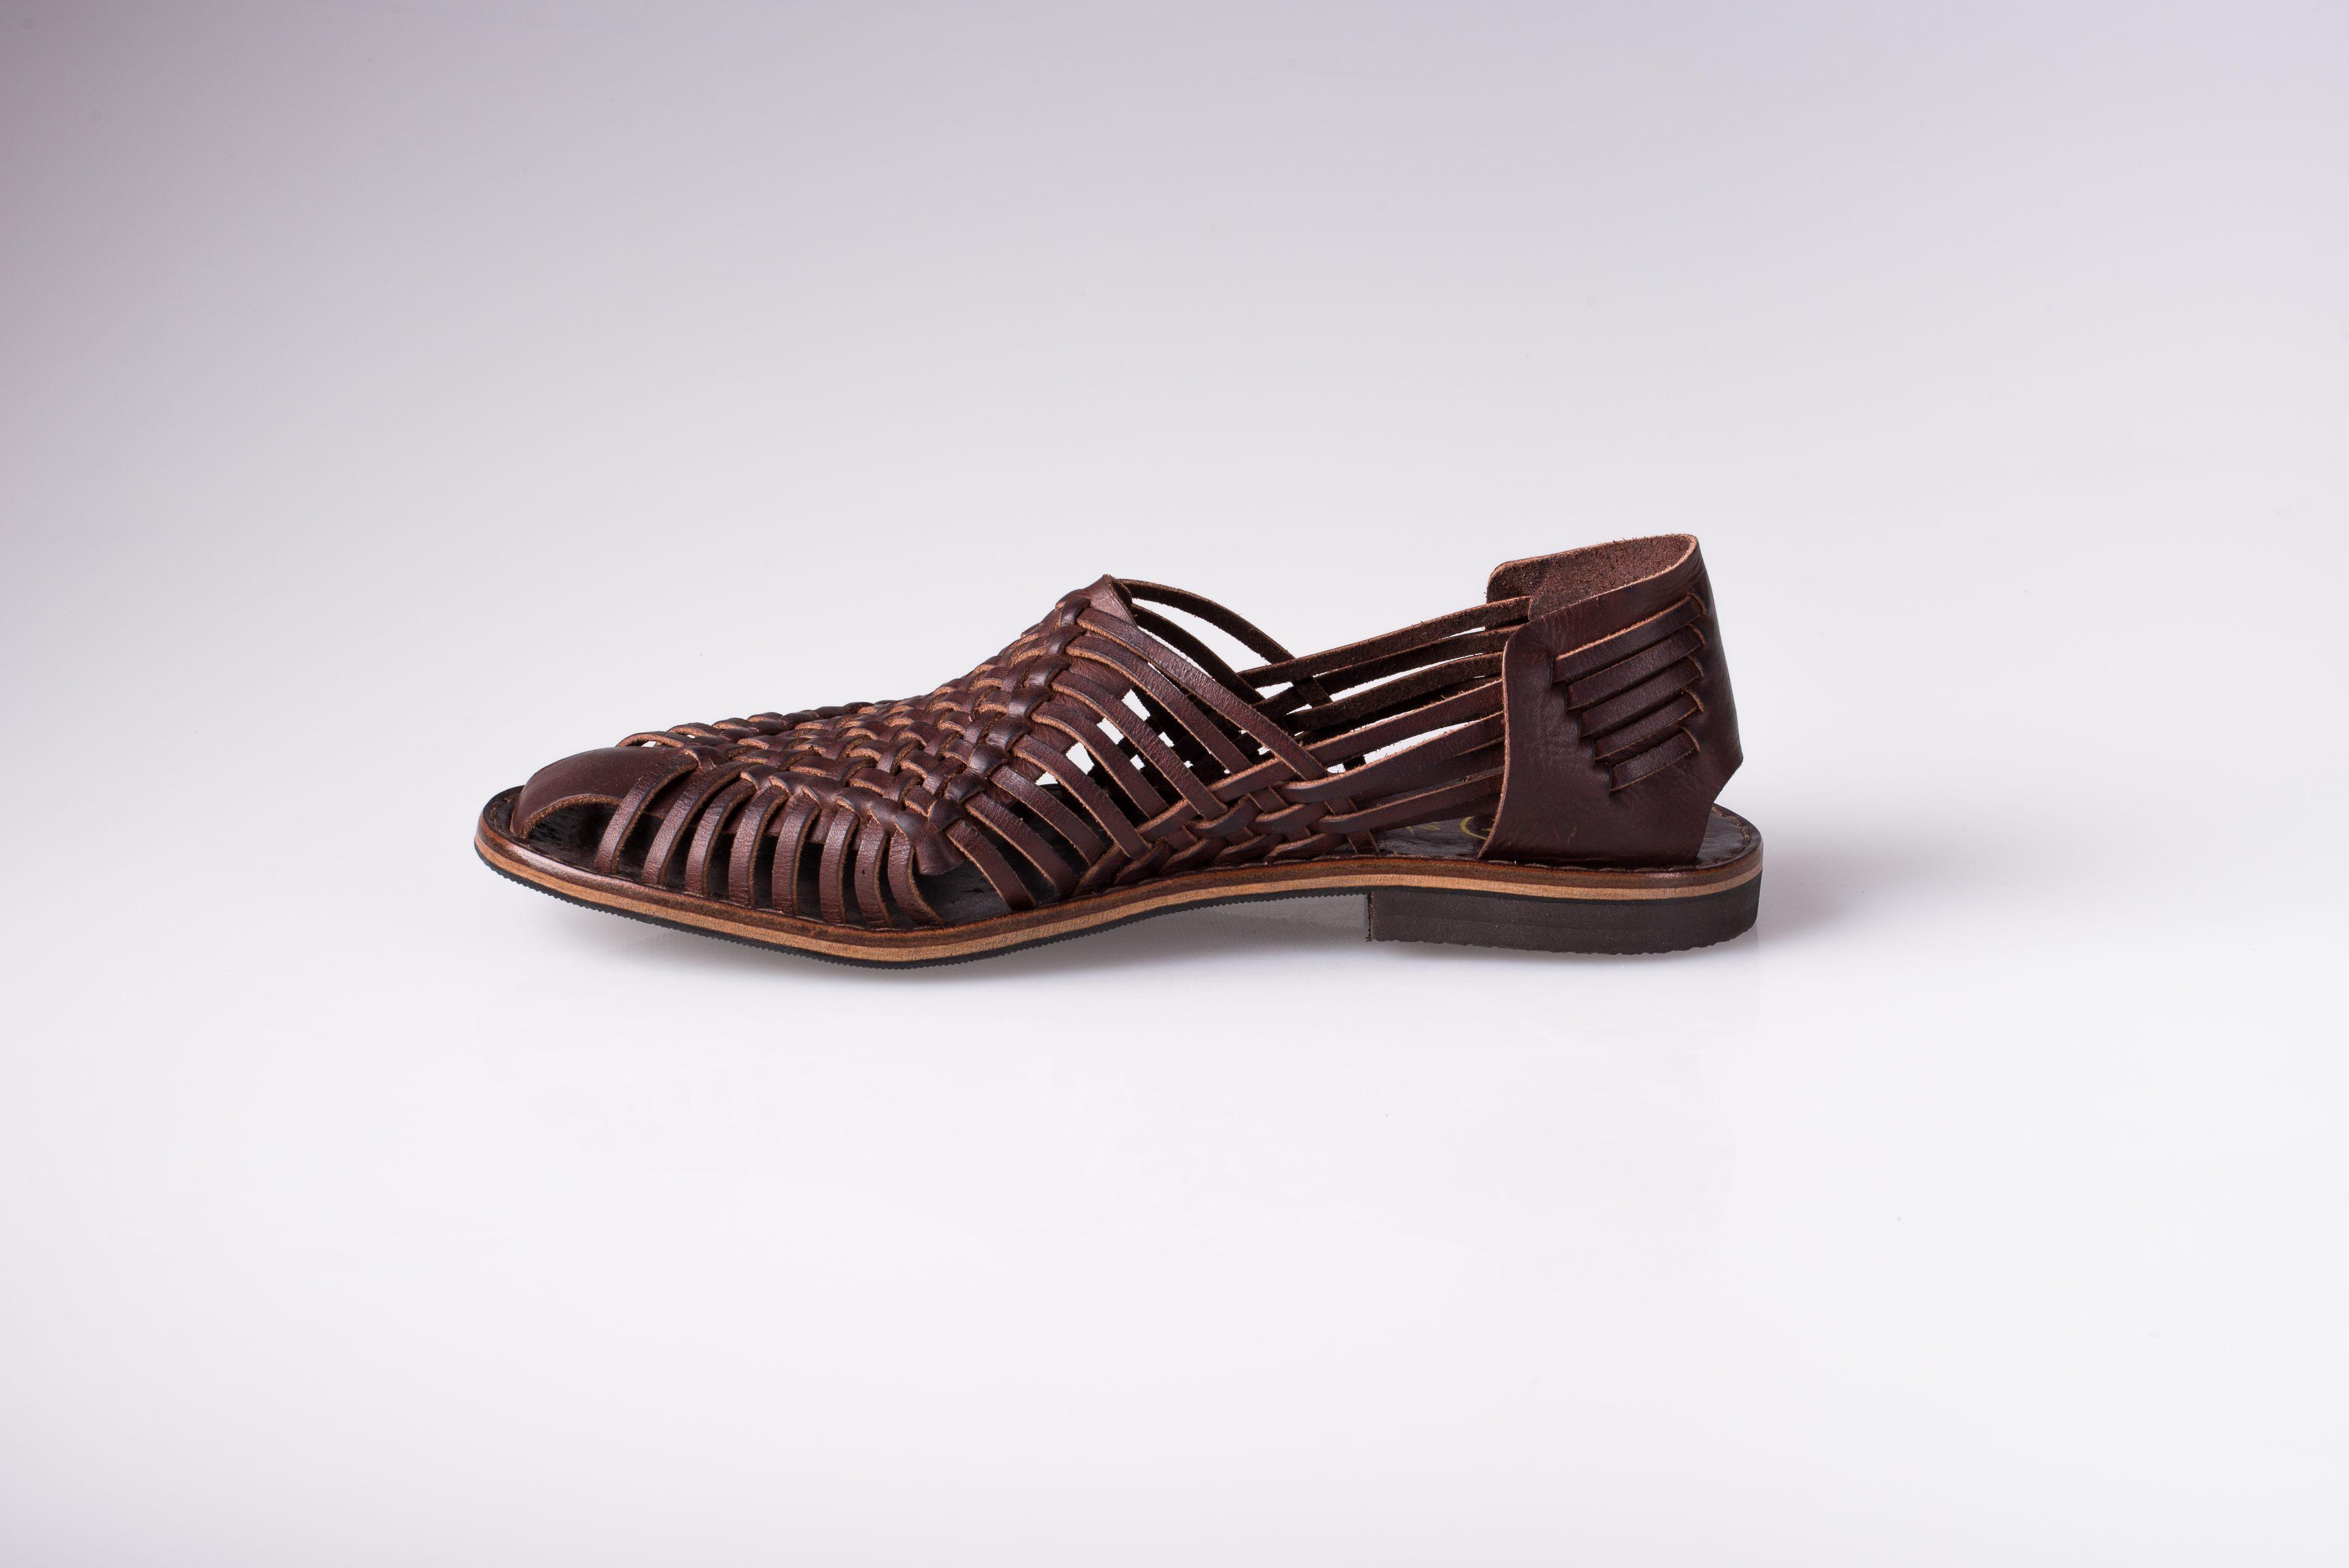 Sandalo Sandali Uomo Intrecciato Sandalo Intrecciato 4RLAjq53